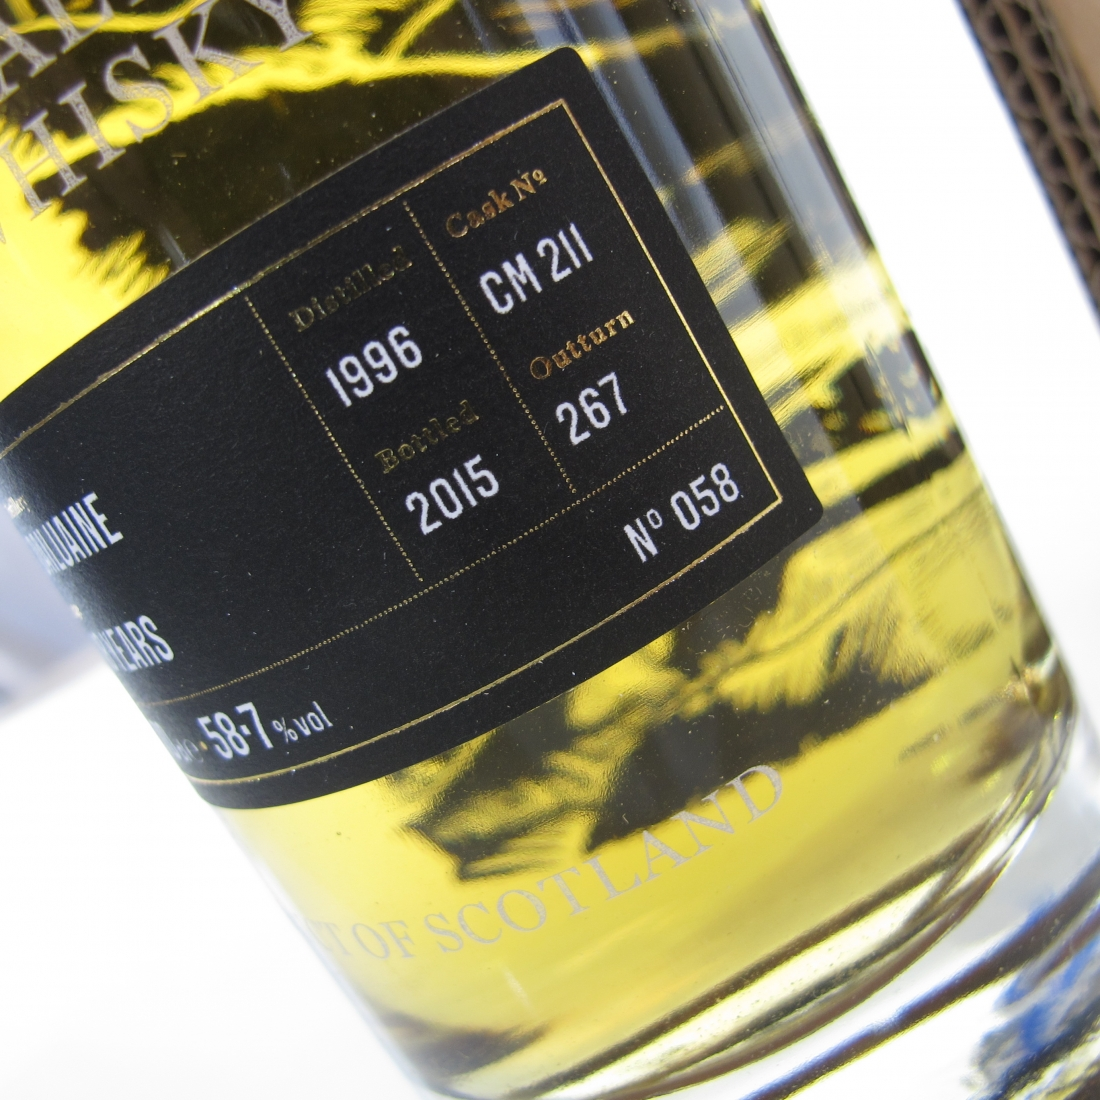 Dailuaine 1996 Golden Cask Reserve 18 Year Old